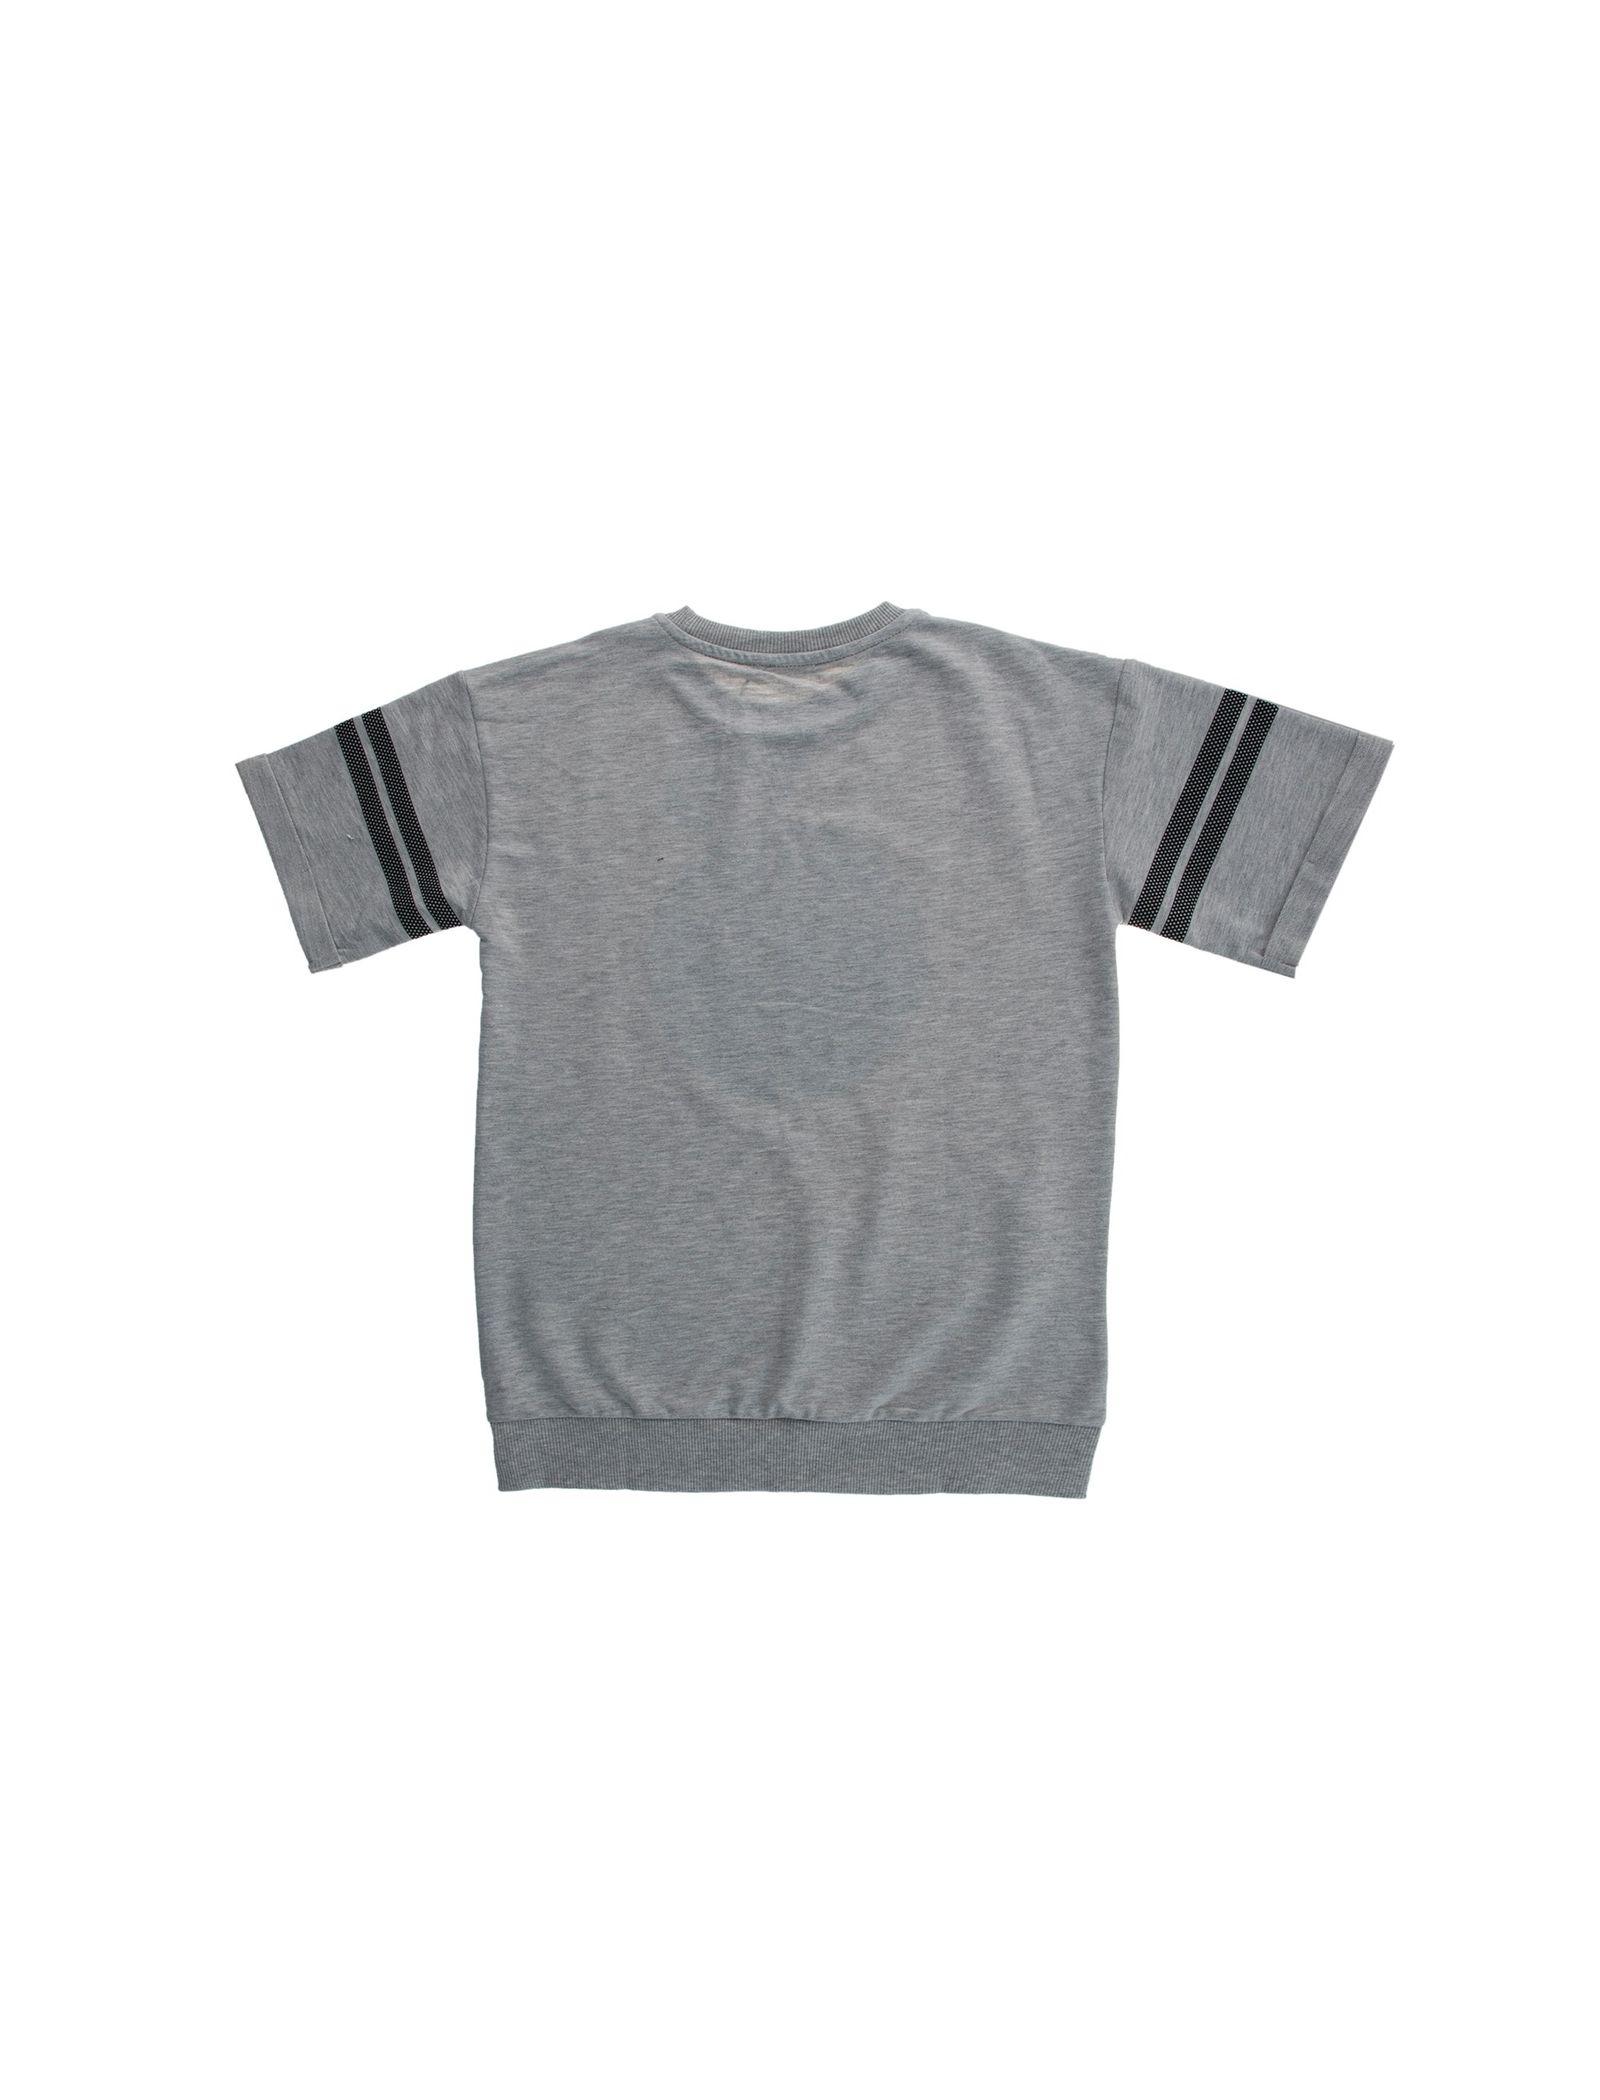 تی شرت یقه گرد پسرانه - کوتون - طوسي - 2